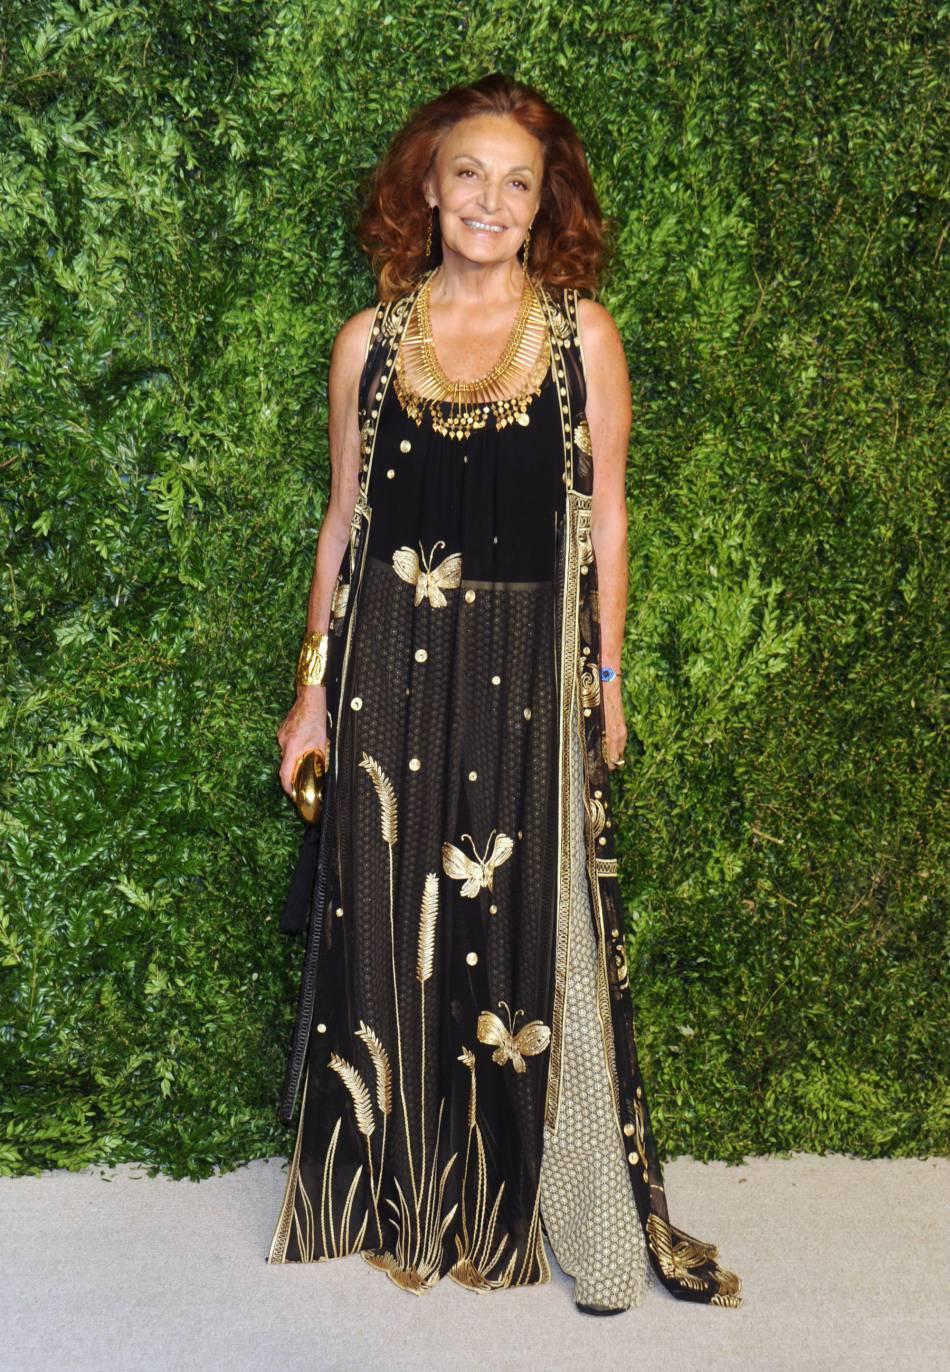 Diane von Furstenberg à la soirée CFDA/Vogue Fashion Fund Awards de ce lundi 2 novembre 2015.